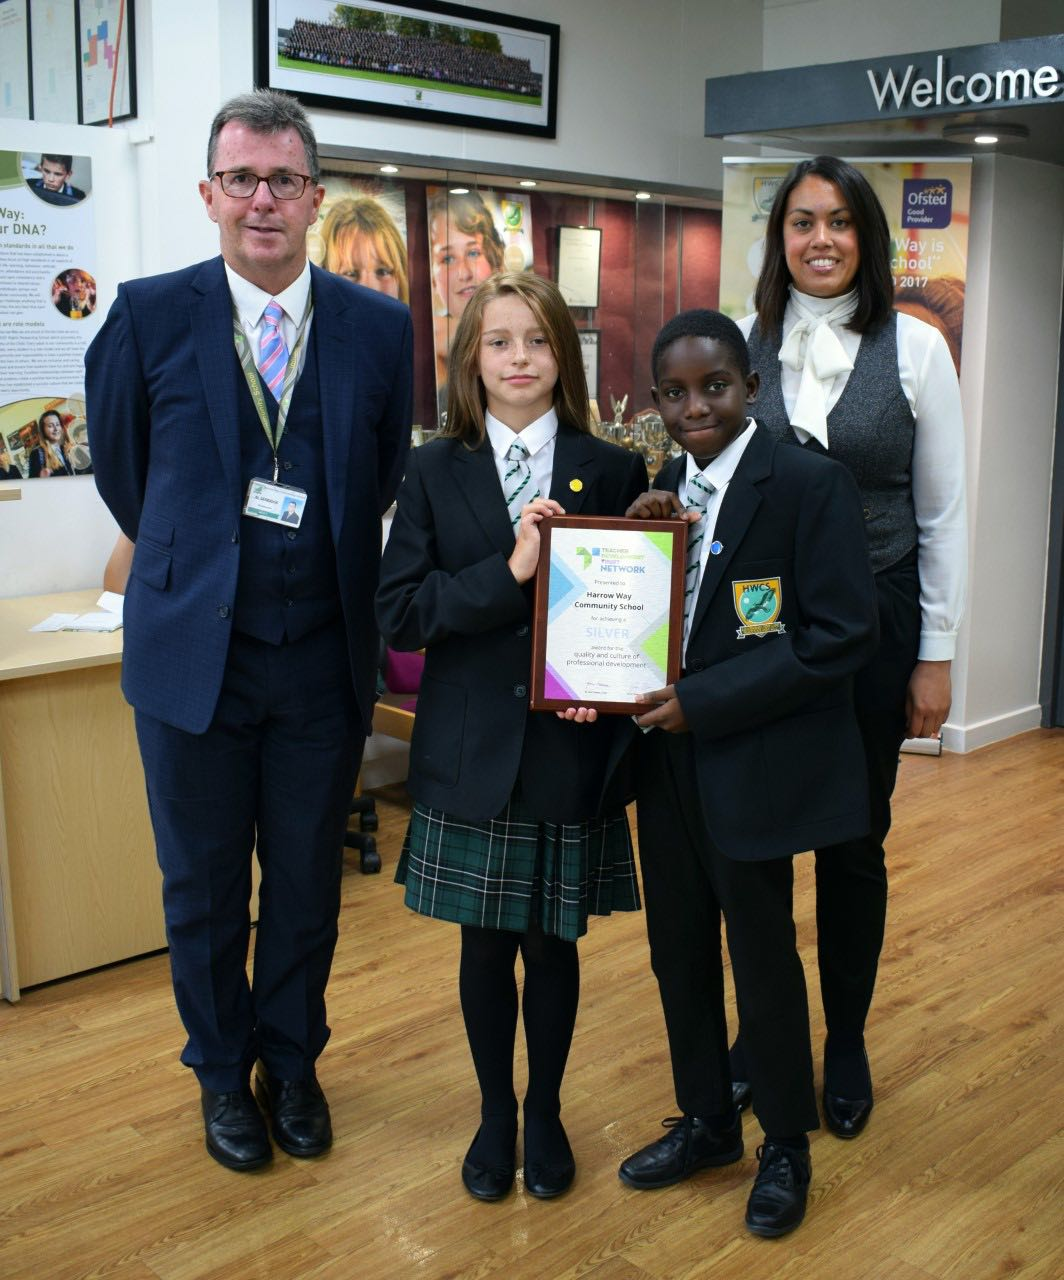 Harrow Way Presented with Silver Award